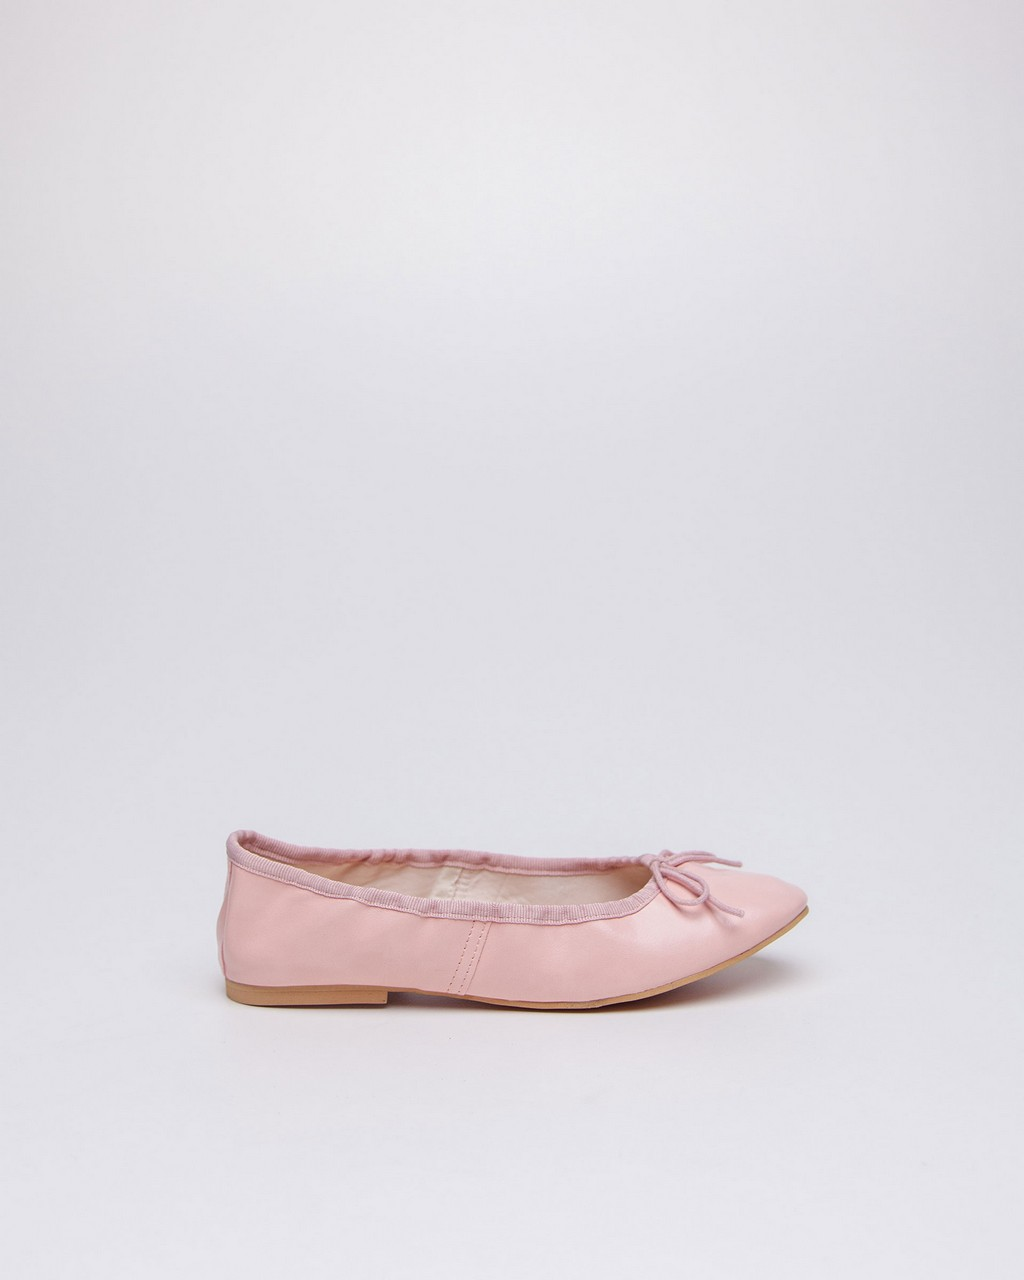 Tagtraume E.Ballerina - Pink(핑크)